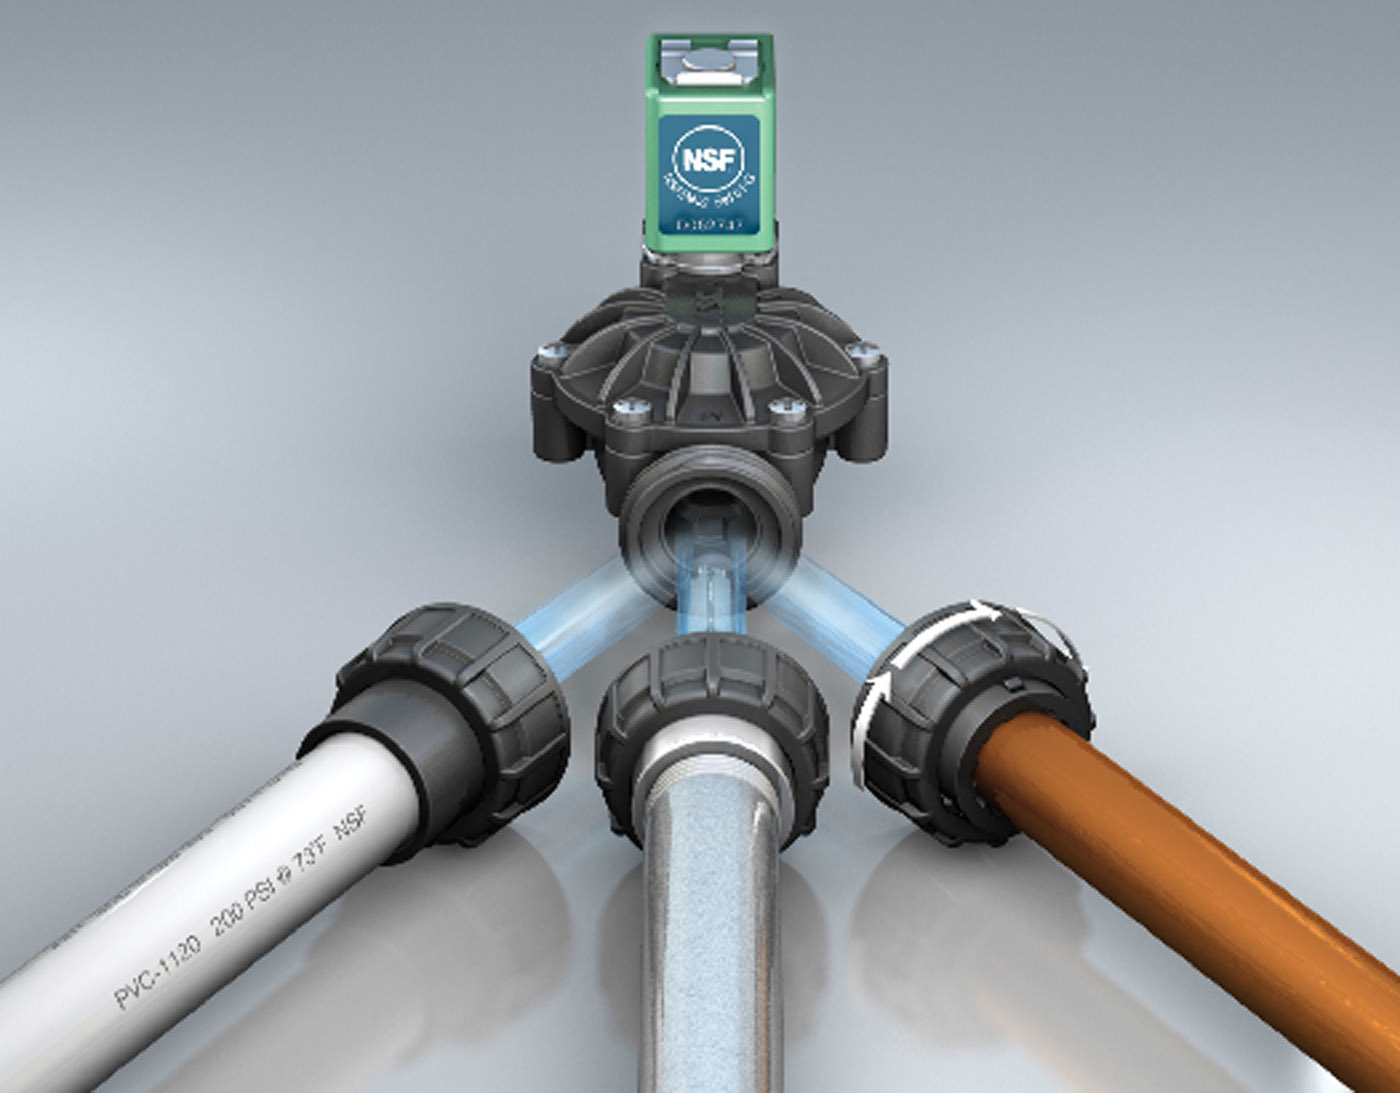 Series 212 composite valves from ASCO